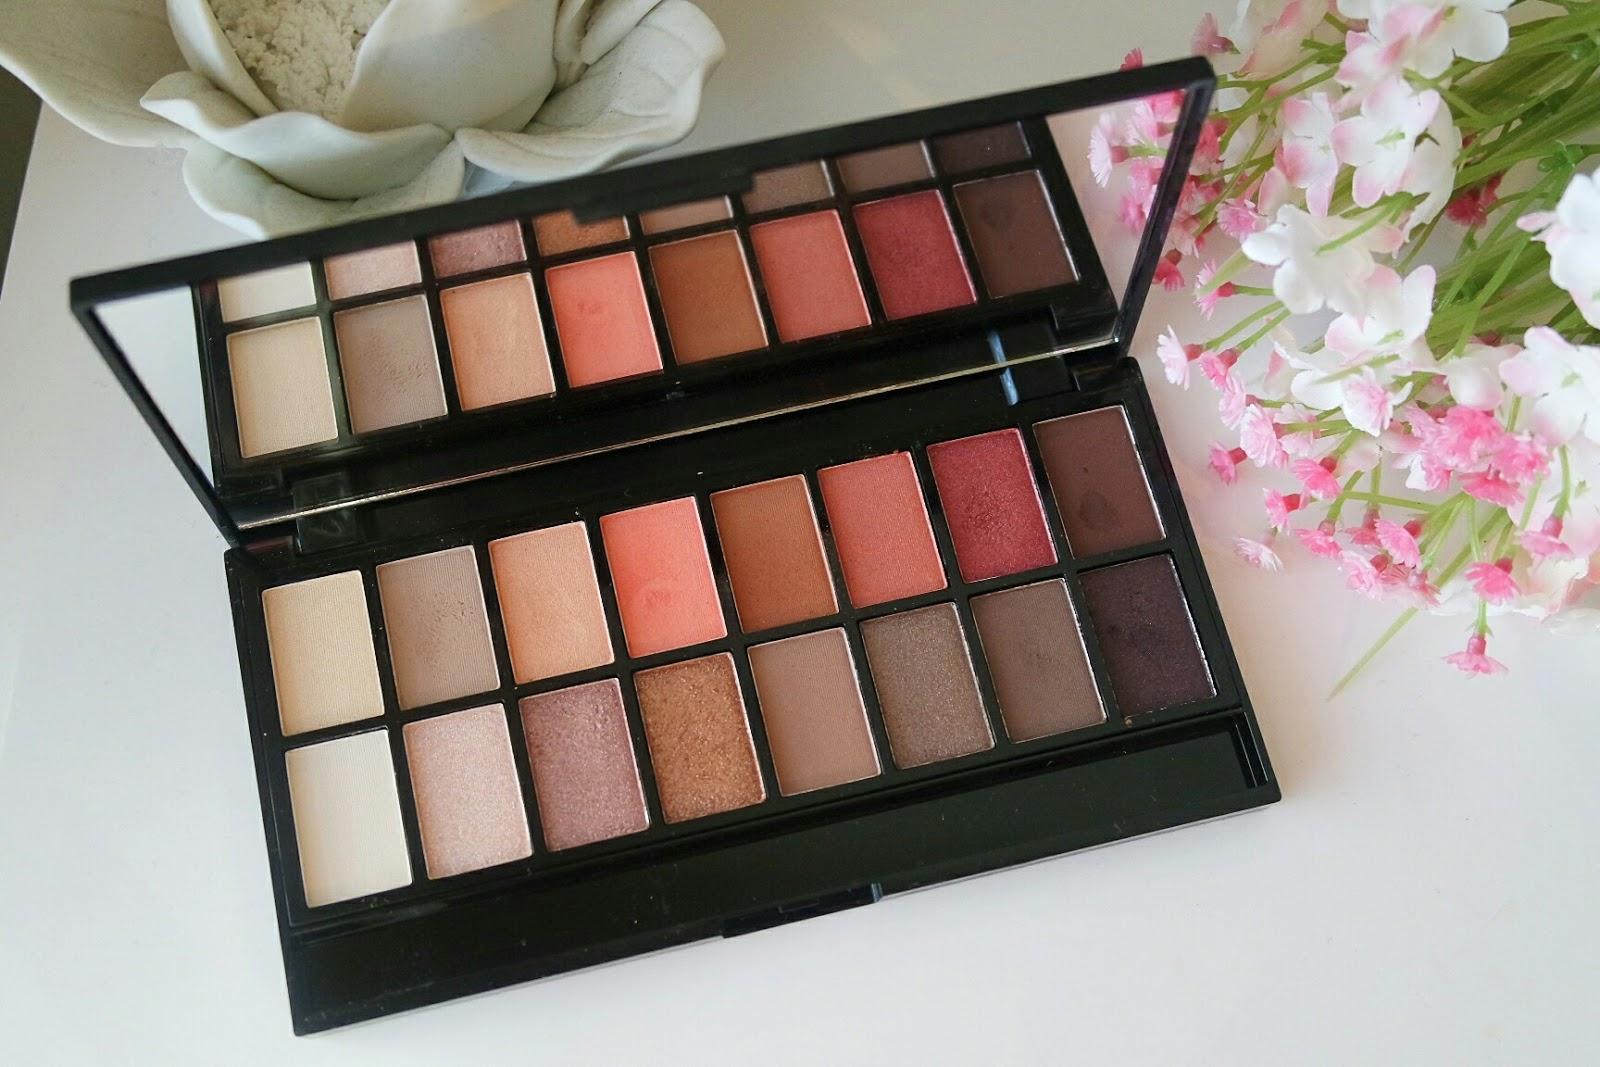 Makeup revolution new trals 2 palette